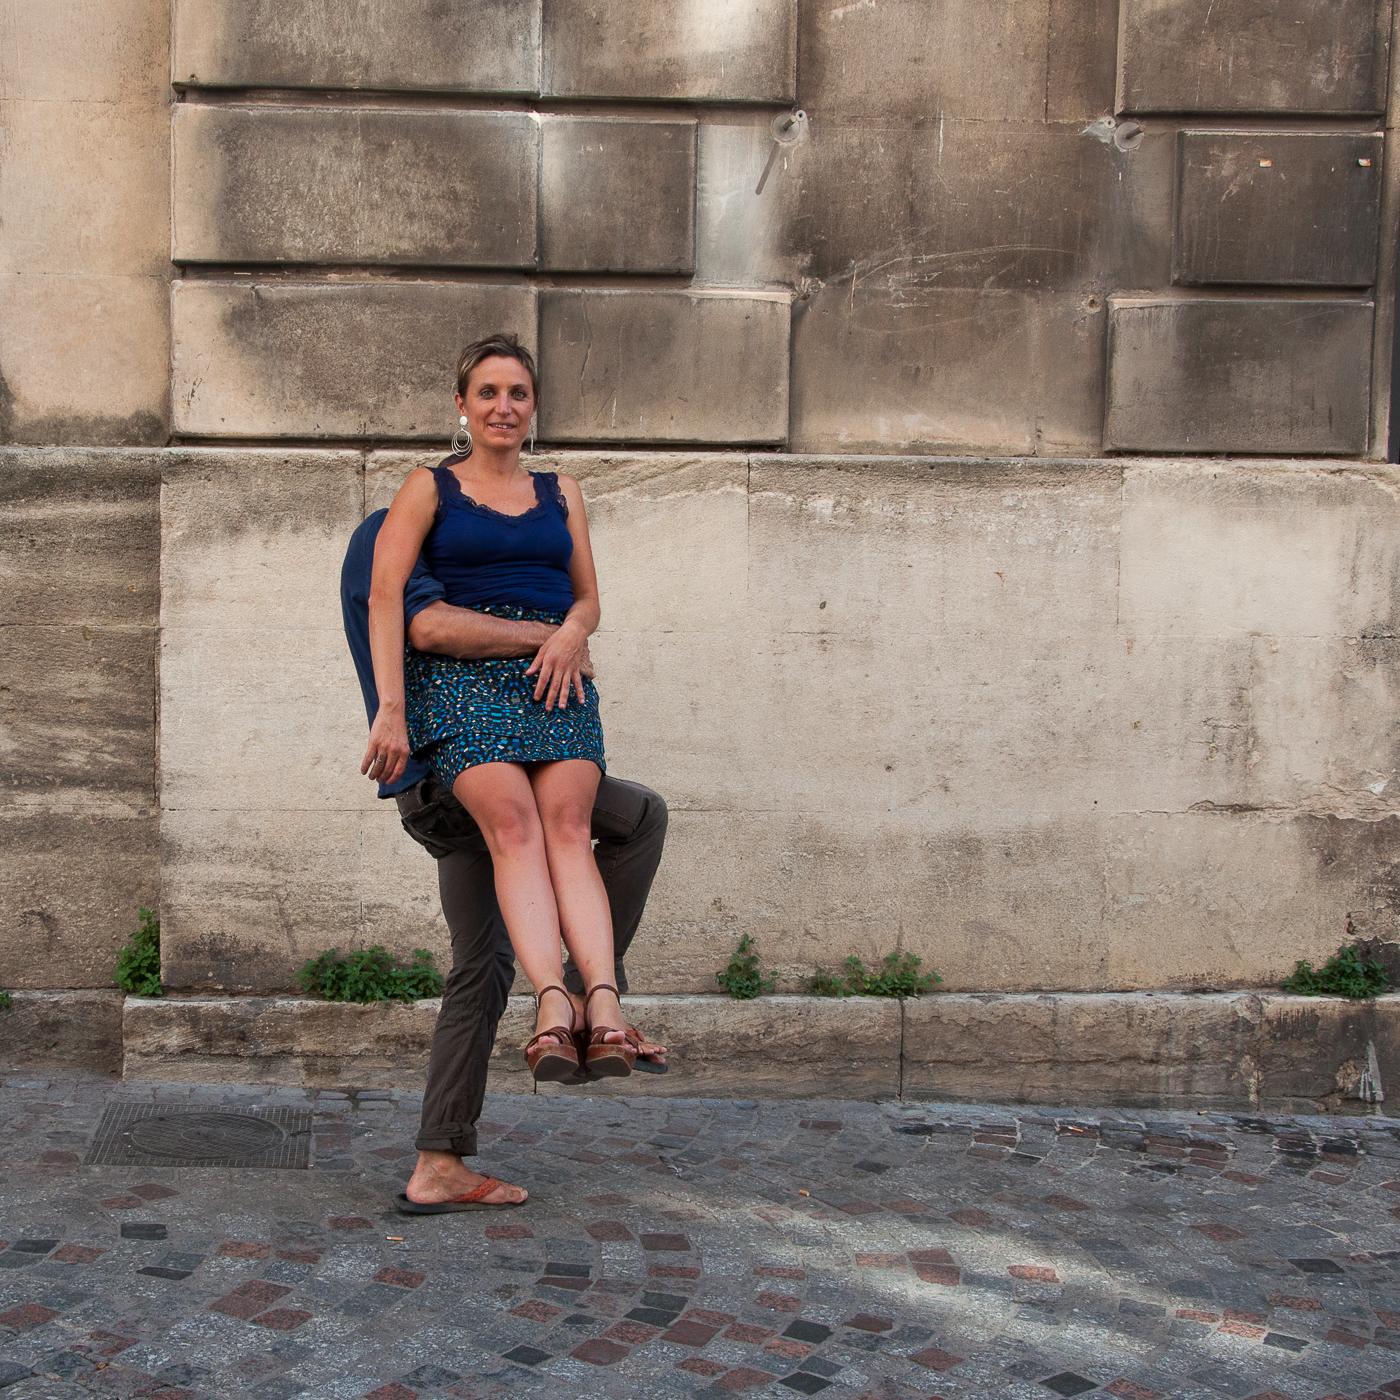 Arles_2015_-_Suspension_à_3_pieds